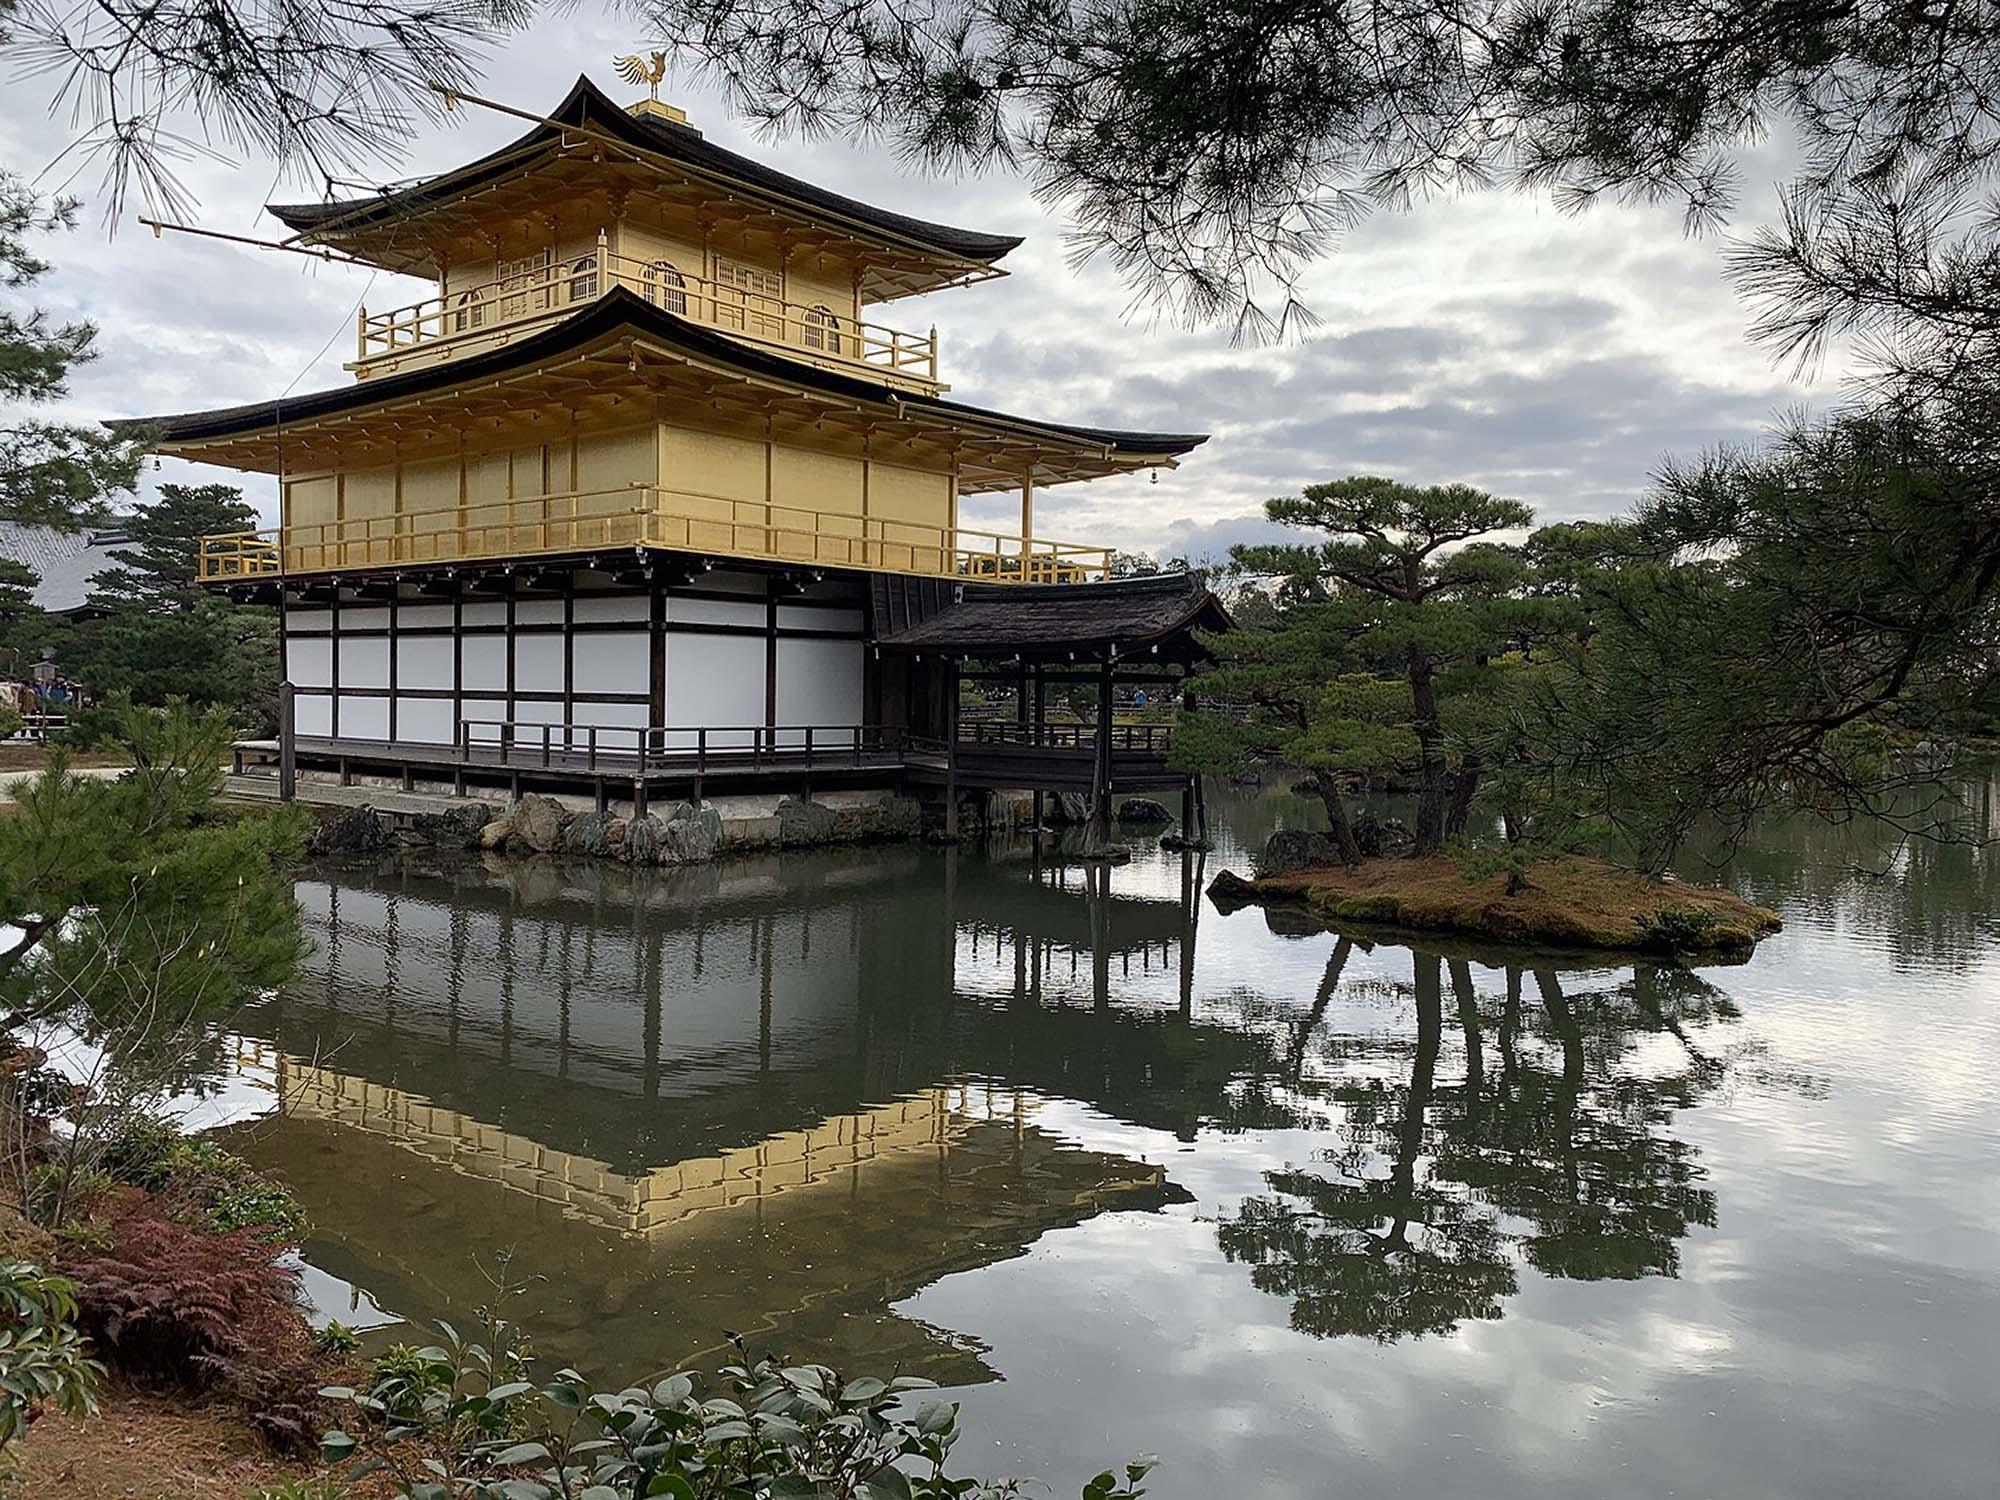 Kinkaku-ji (Golden Pavilion), Kyoto, Japan